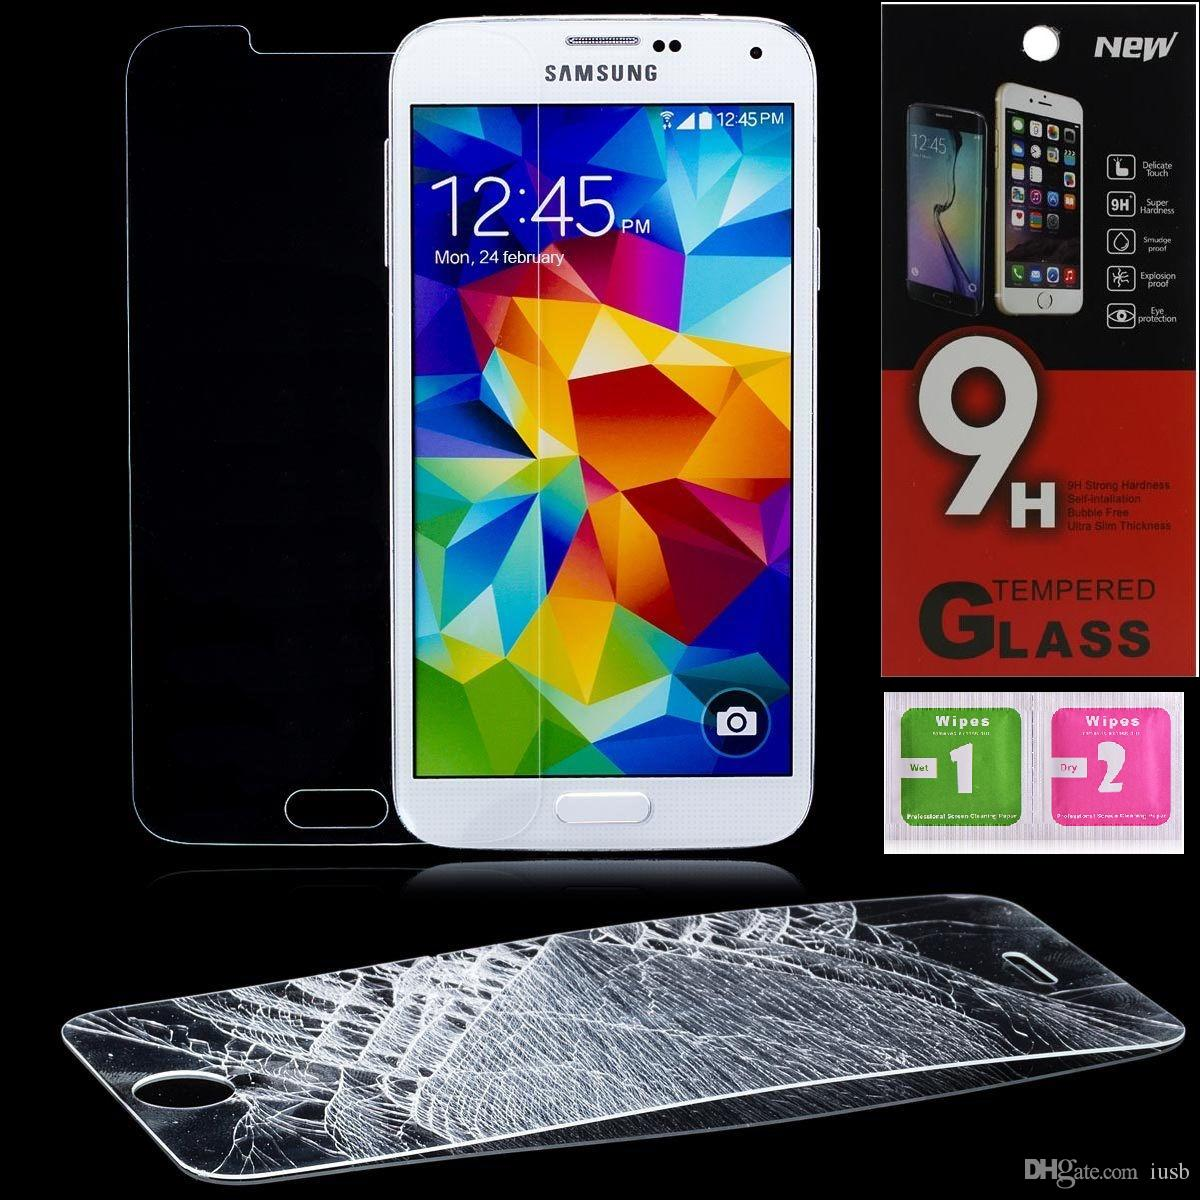 Voor Galaxy S5 S6 Opmerking 4 5 iPhone 6 6S Plus HTC M9 LG G4 Sony Xperia Z4 Z5-scherm Protector Gehard Glas Anti-Krasfilm 9H 2.5D Film